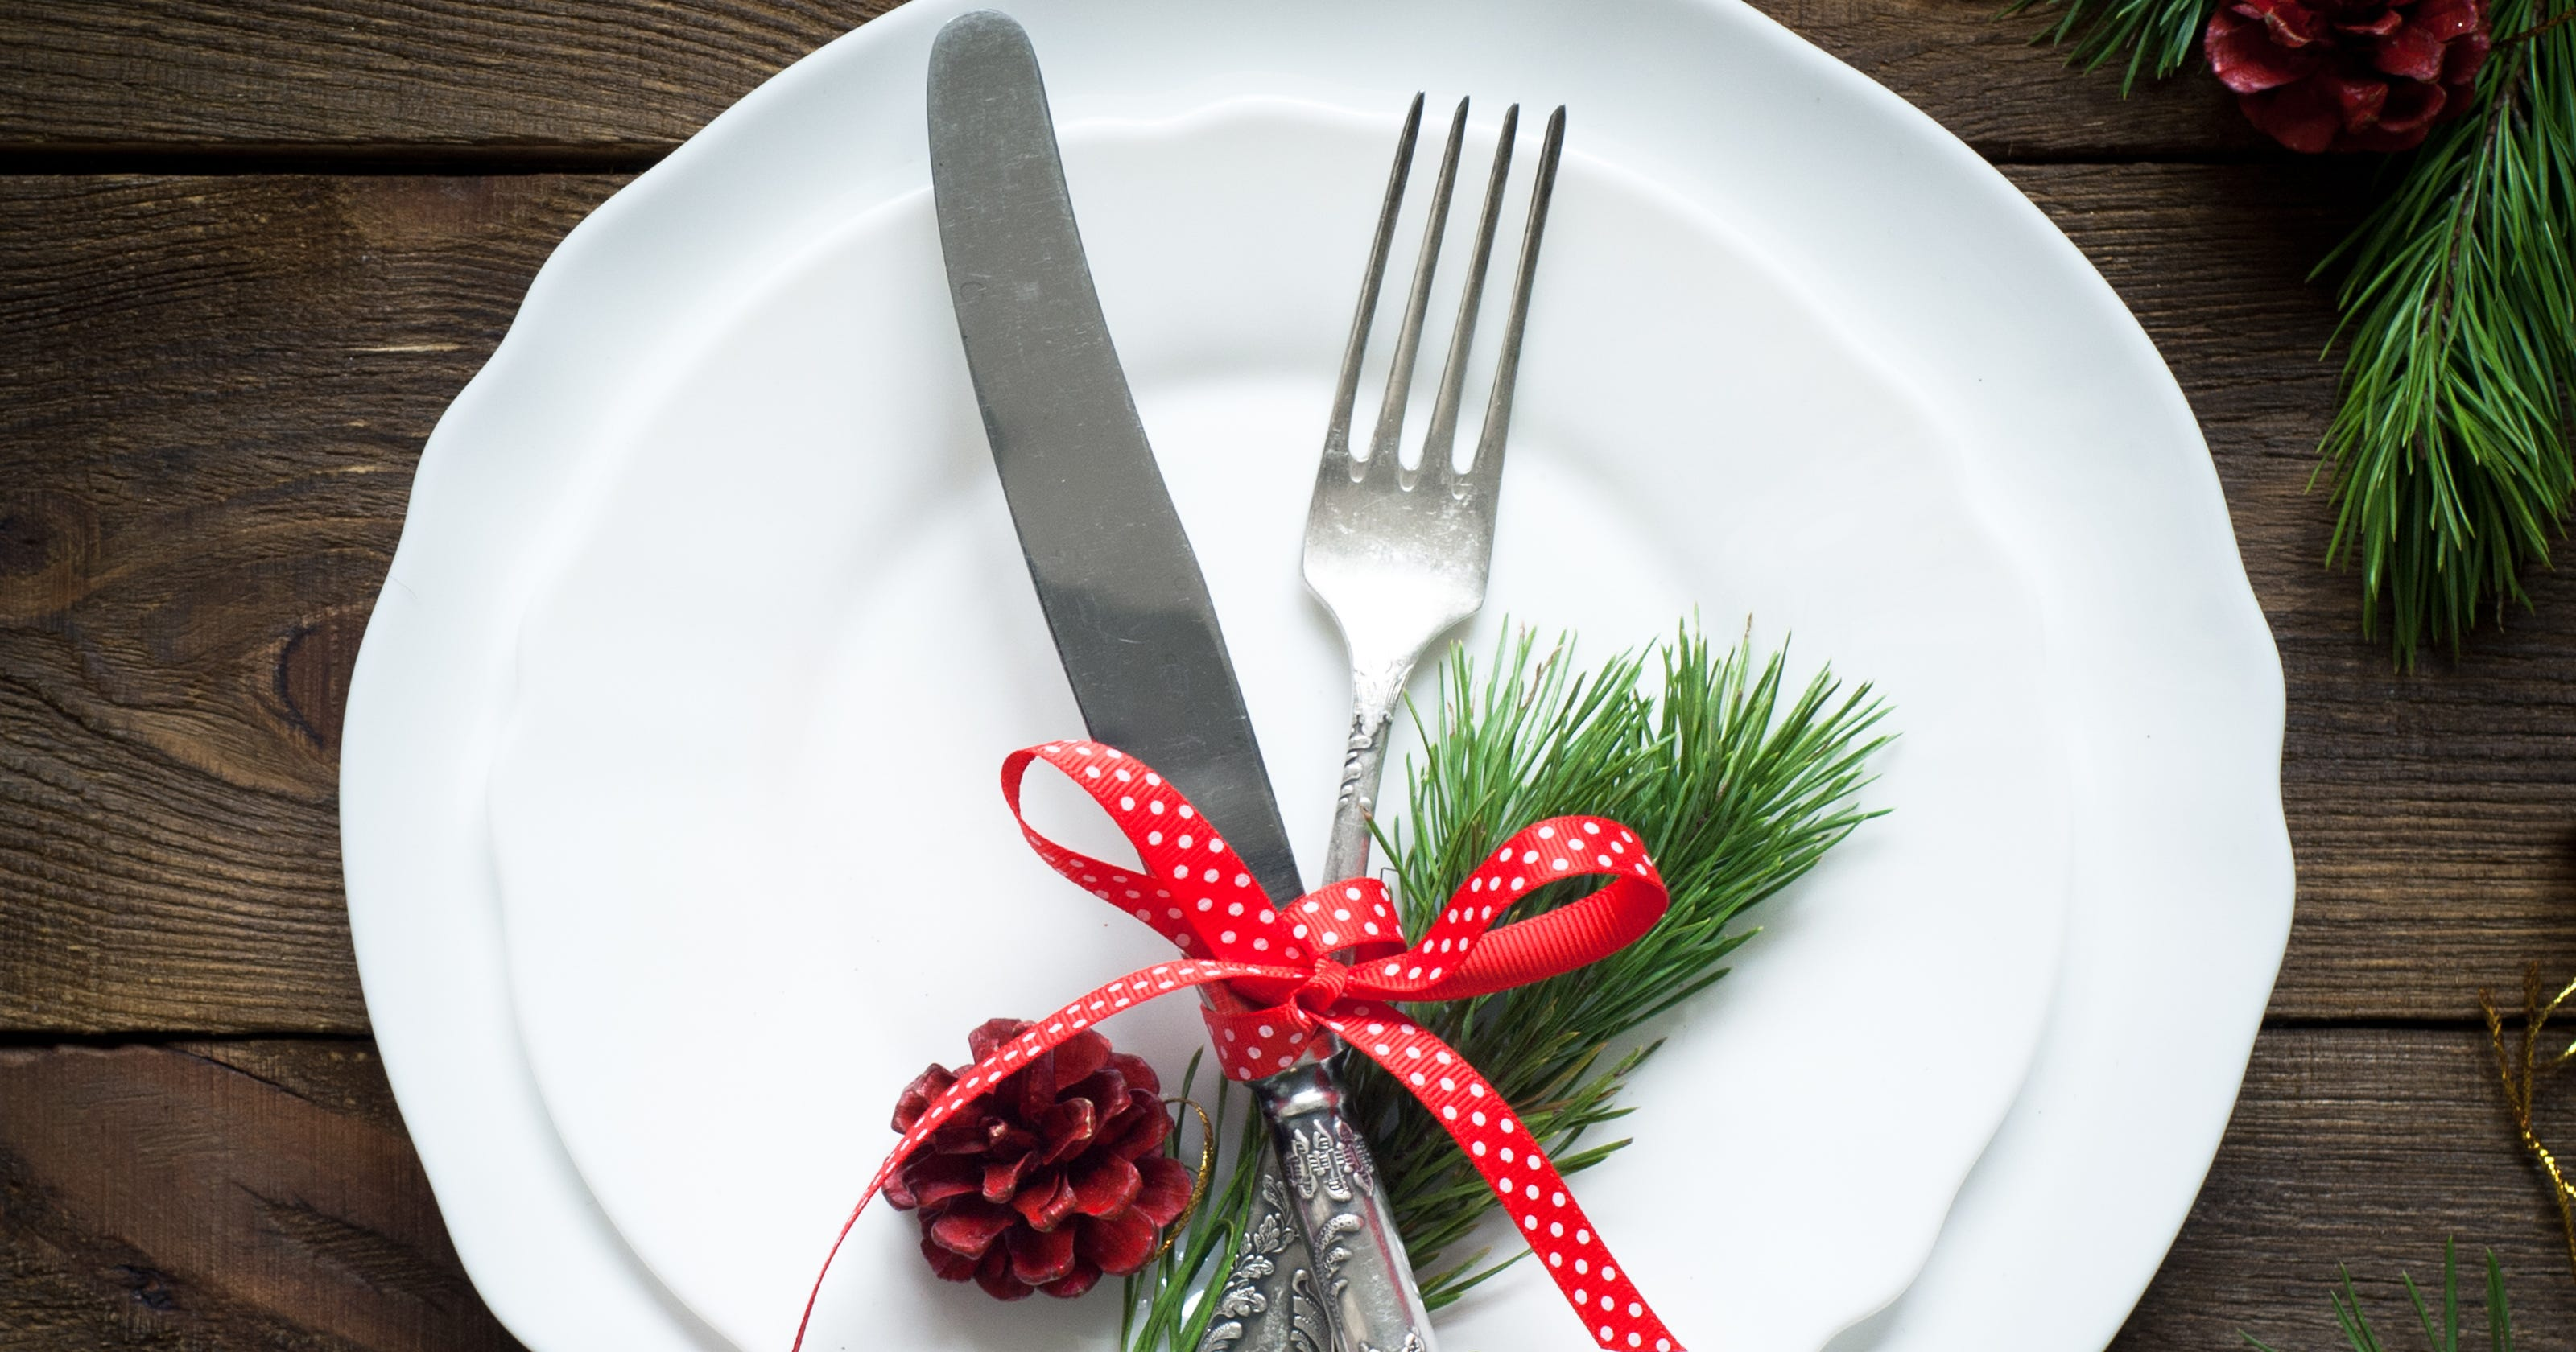 Free Christmas Dinner Near Me.Free Christmas Dinner Offered Dec 25